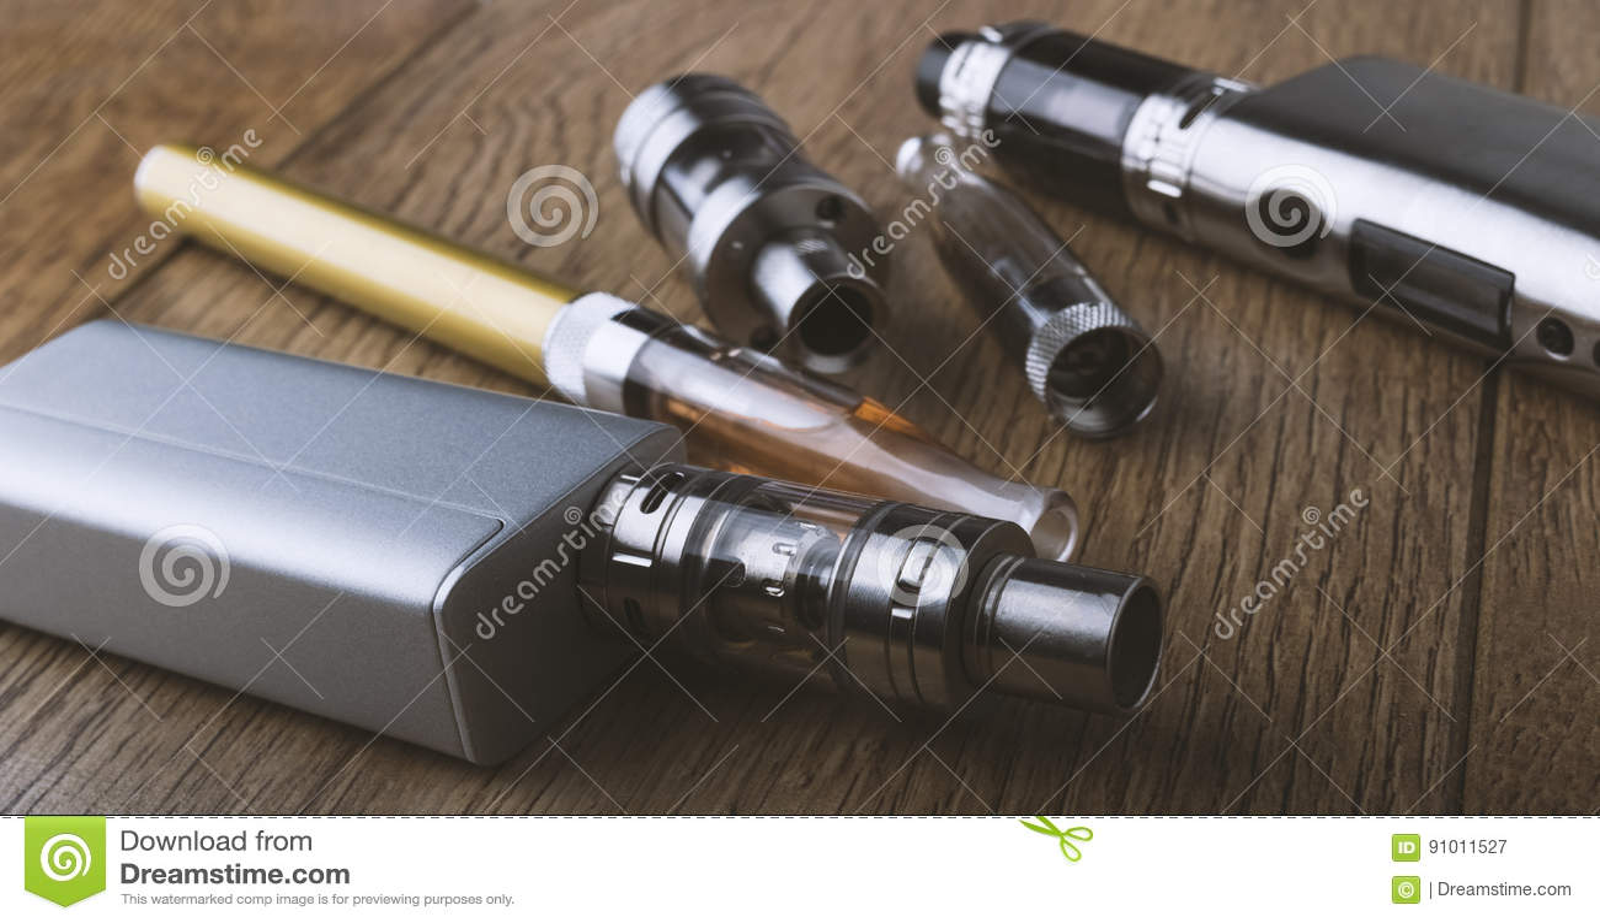 Vape pen and vaping devices, mods, atomizers, e cig, e cigarette